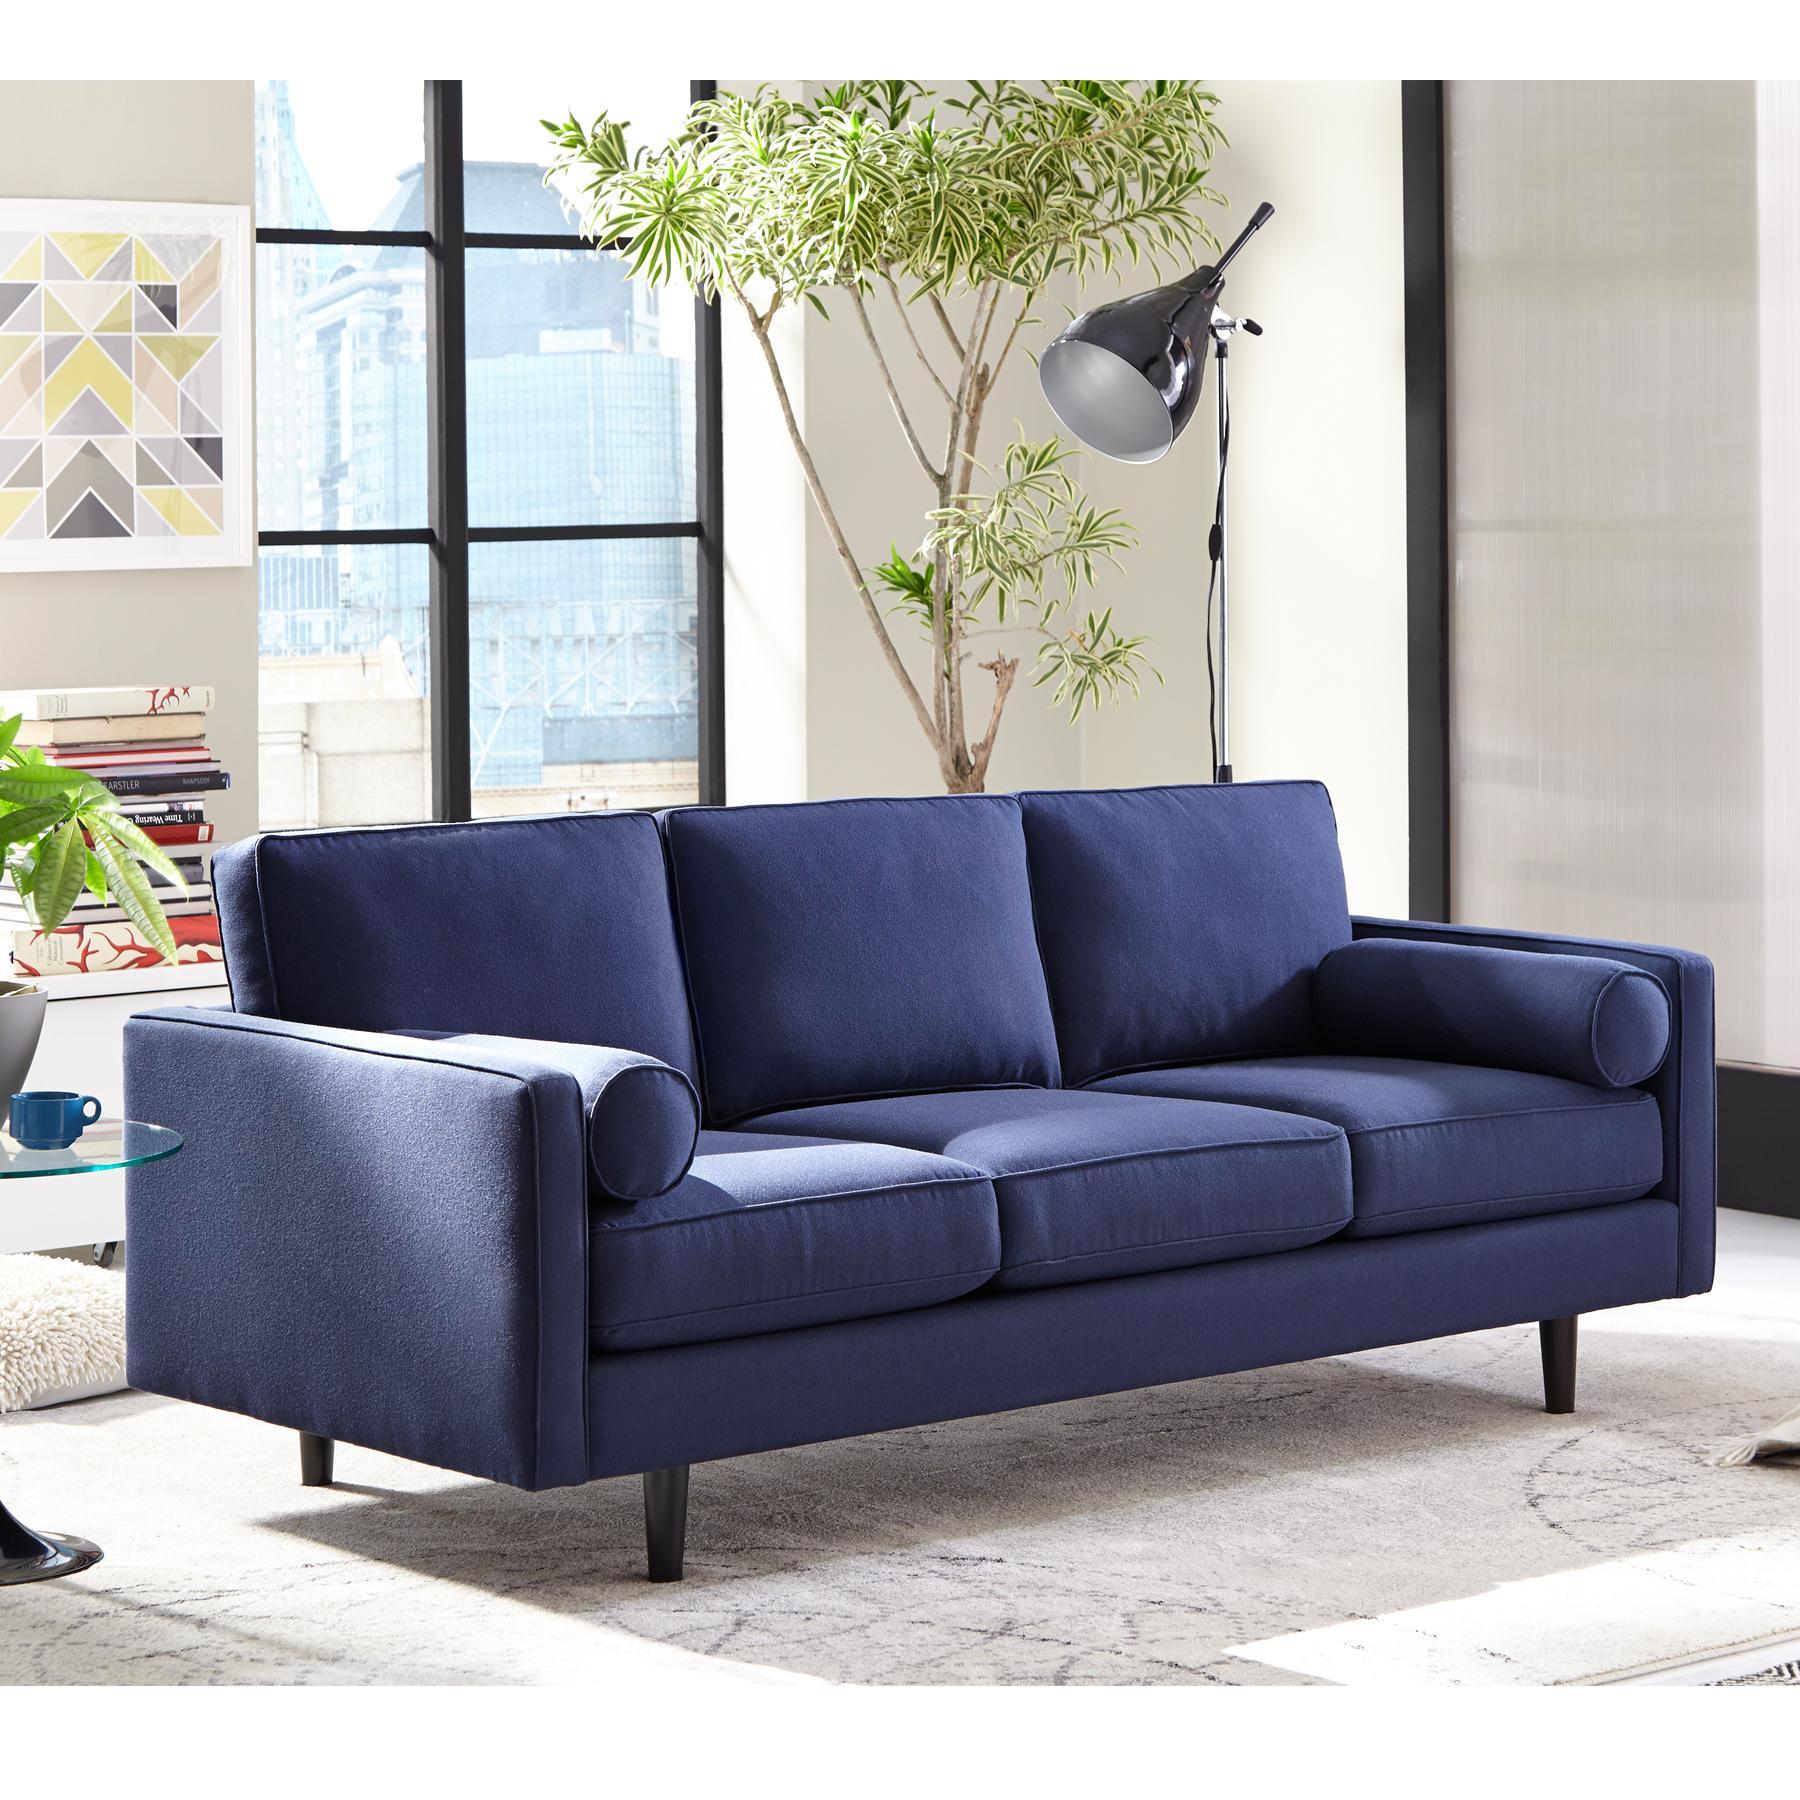 Terrific Brandon 80 Sofa 150 Fabrics Sofas And Sectionals Alphanode Cool Chair Designs And Ideas Alphanodeonline